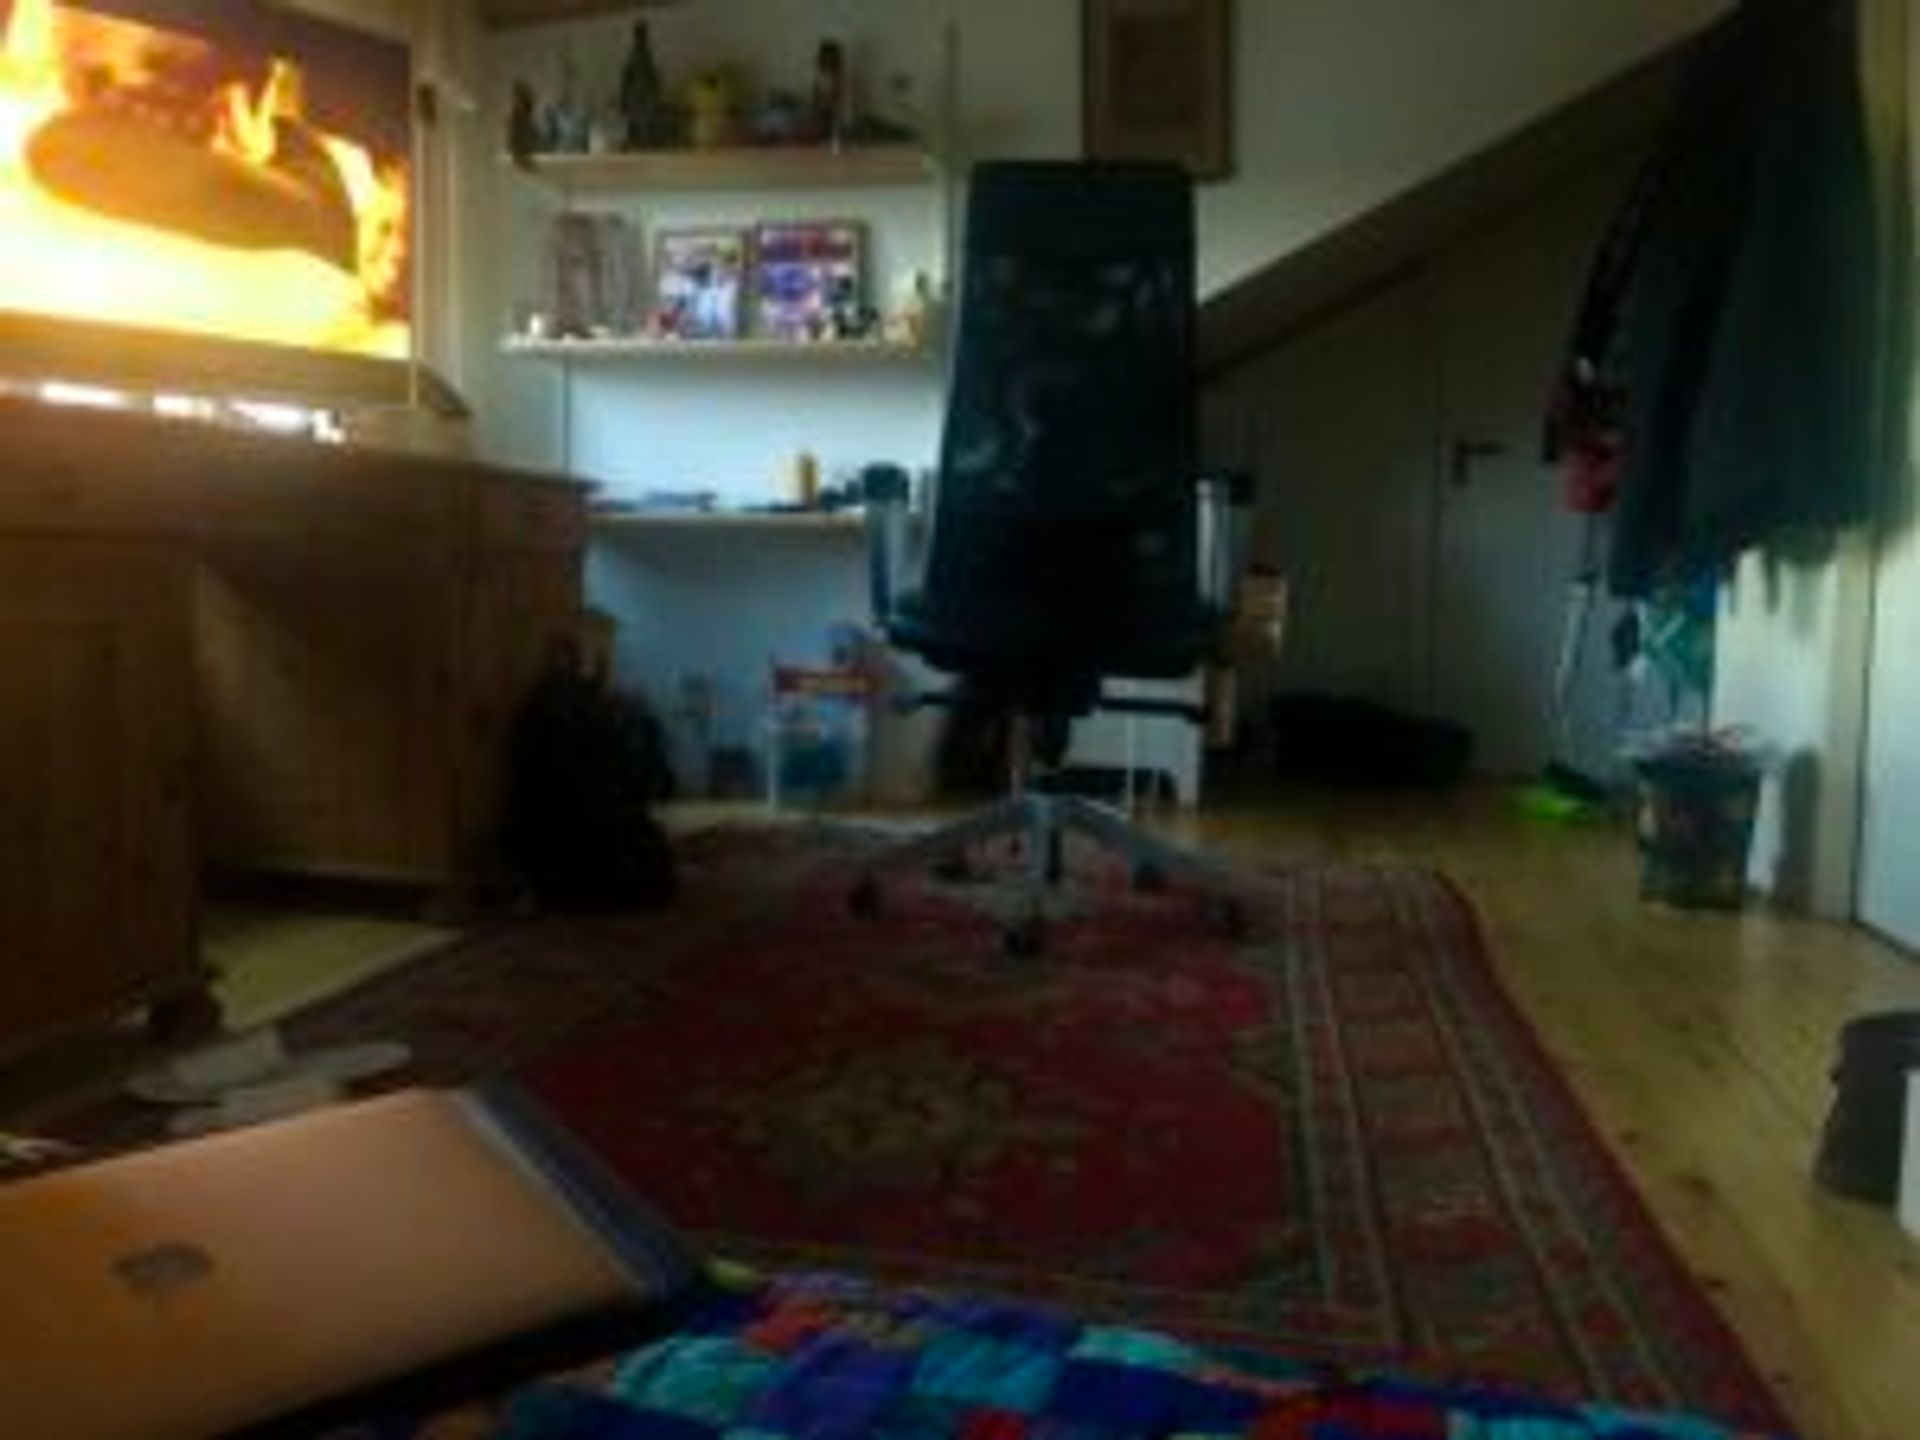 Camilo's room.